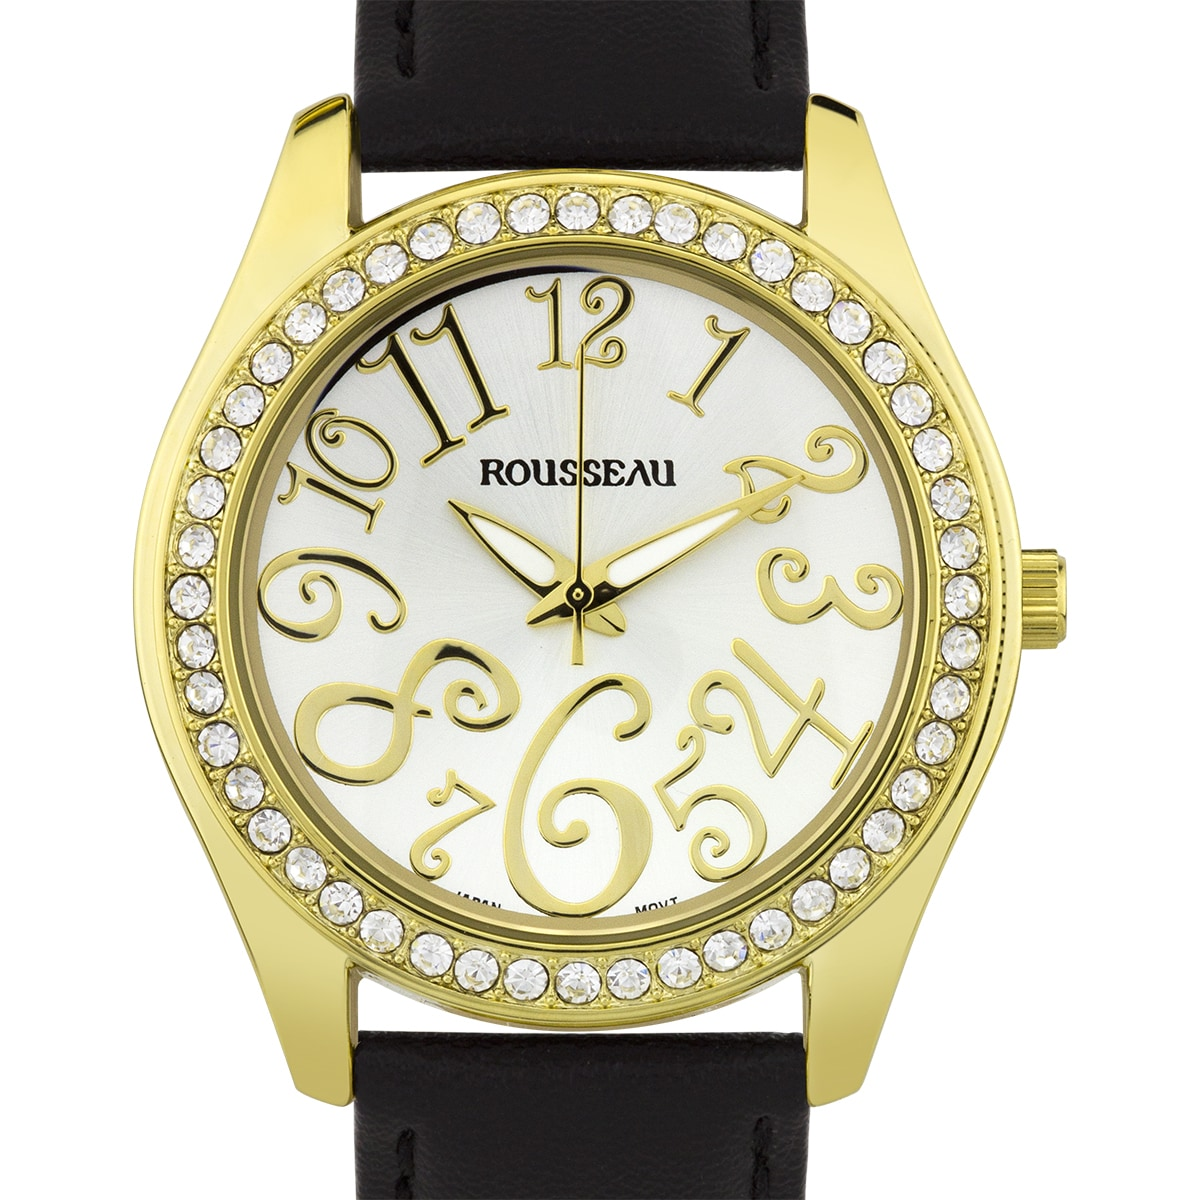 444e76e38cb2 Rousseau Calame Ladies Watch - Black Genuine Leather Strap